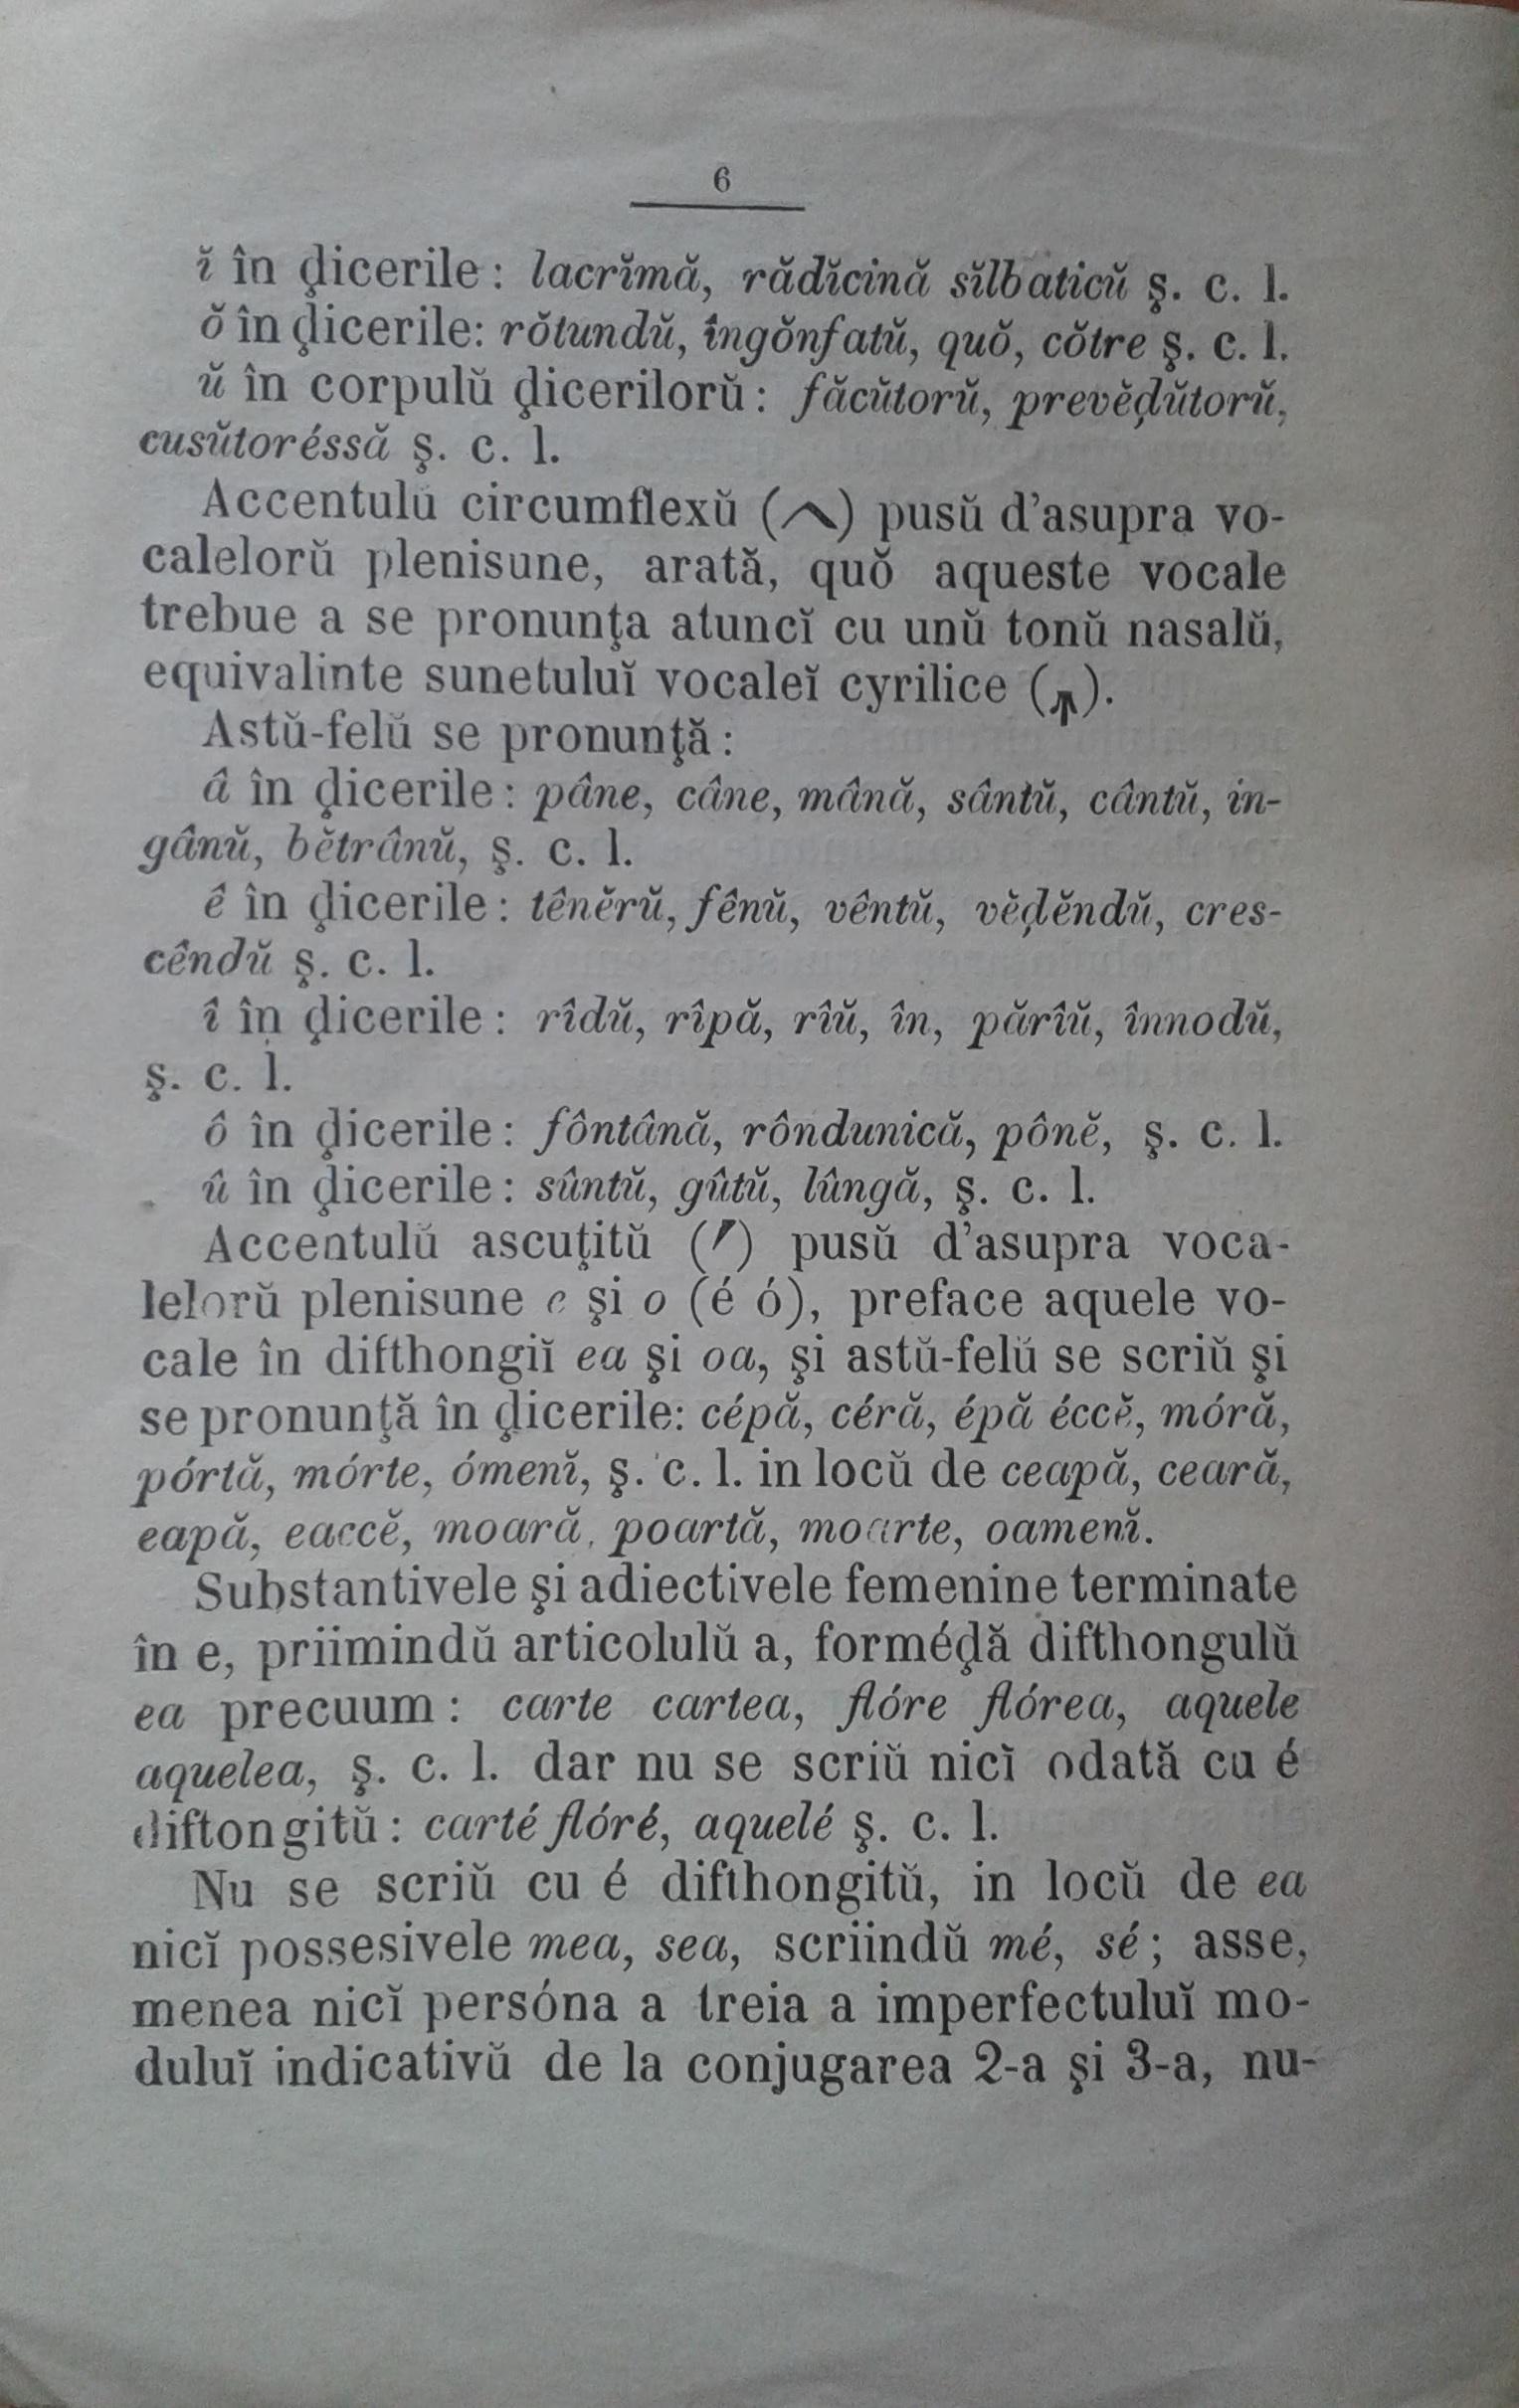 Regule ortografice 1871 (5).jpg